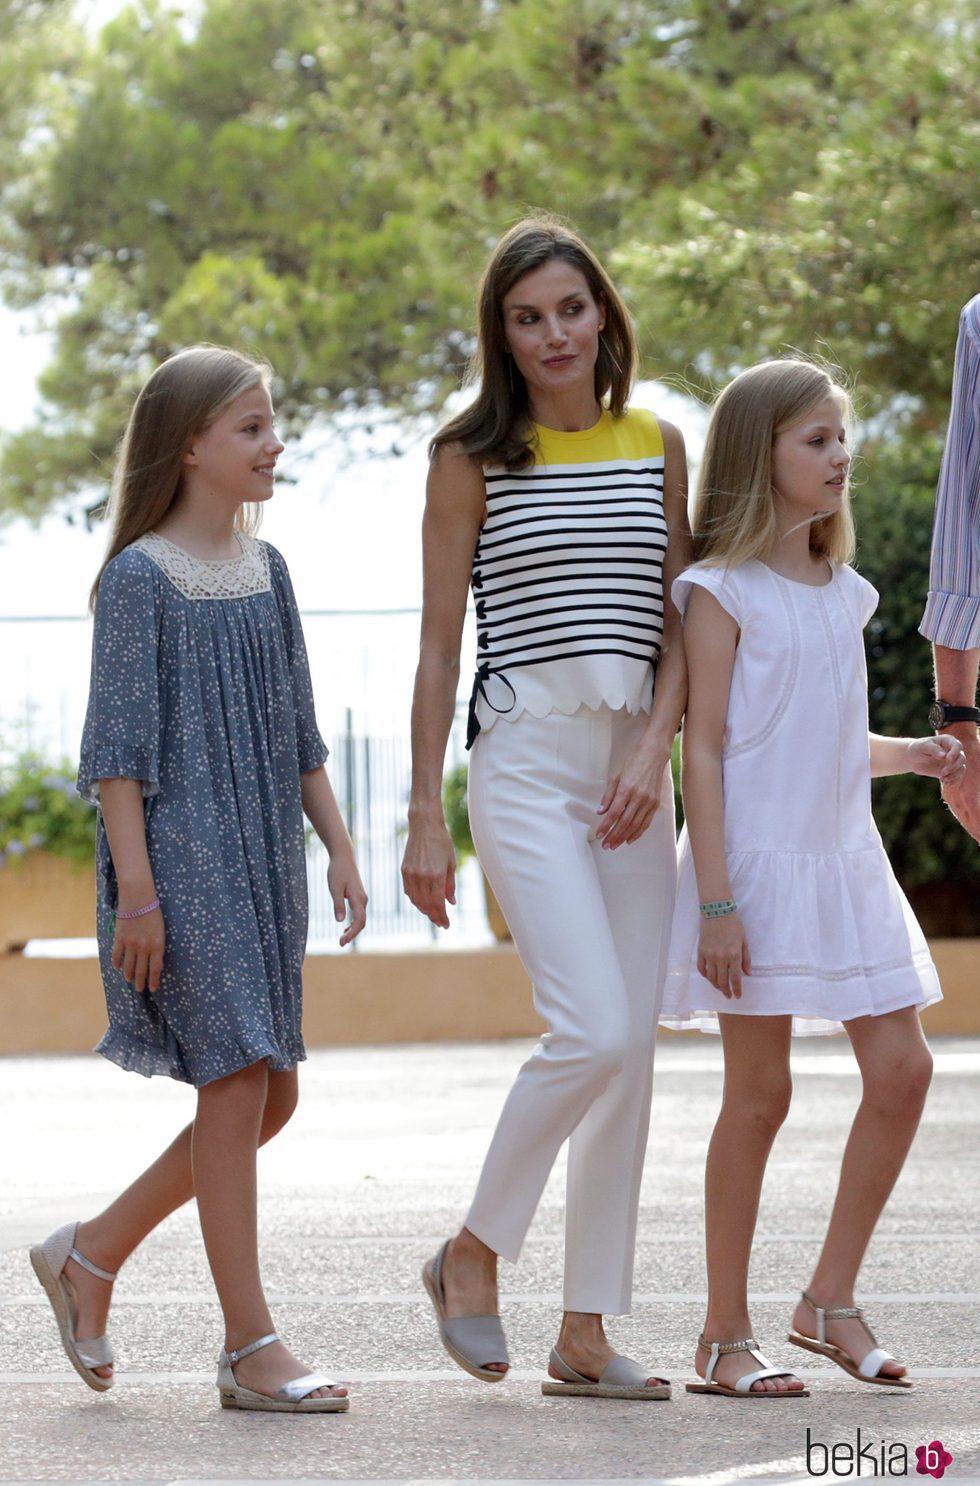 La Reina Letizia con camiseta de Mango y pantalones de Massimo Dutti